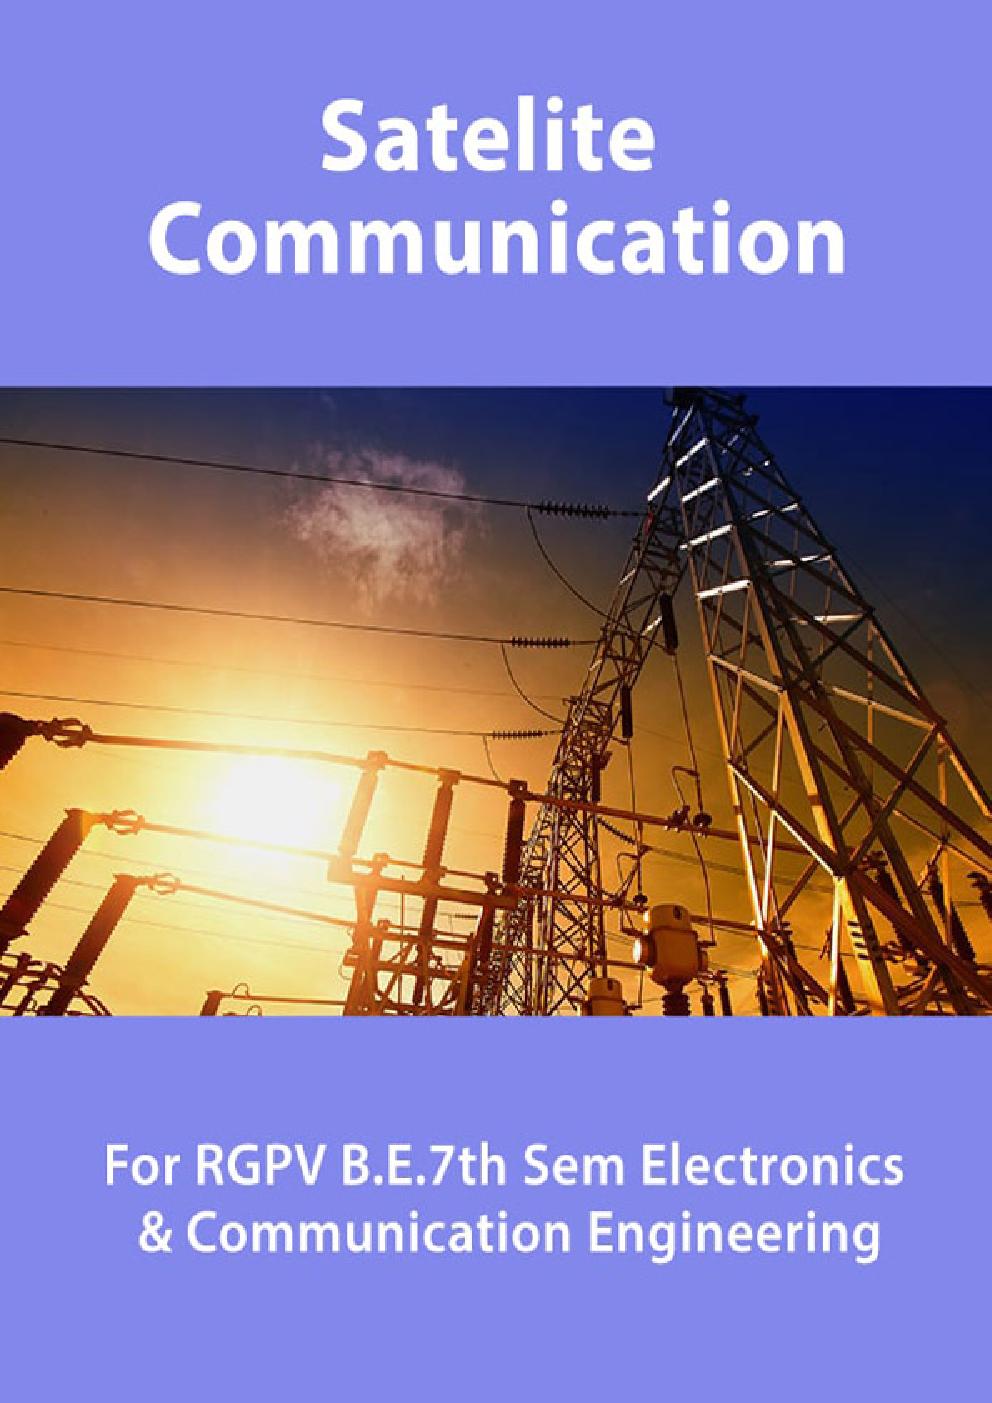 Satelite Communication For RGPV B.E. 7th Sem Electronics & Communication Engineering - Page 1